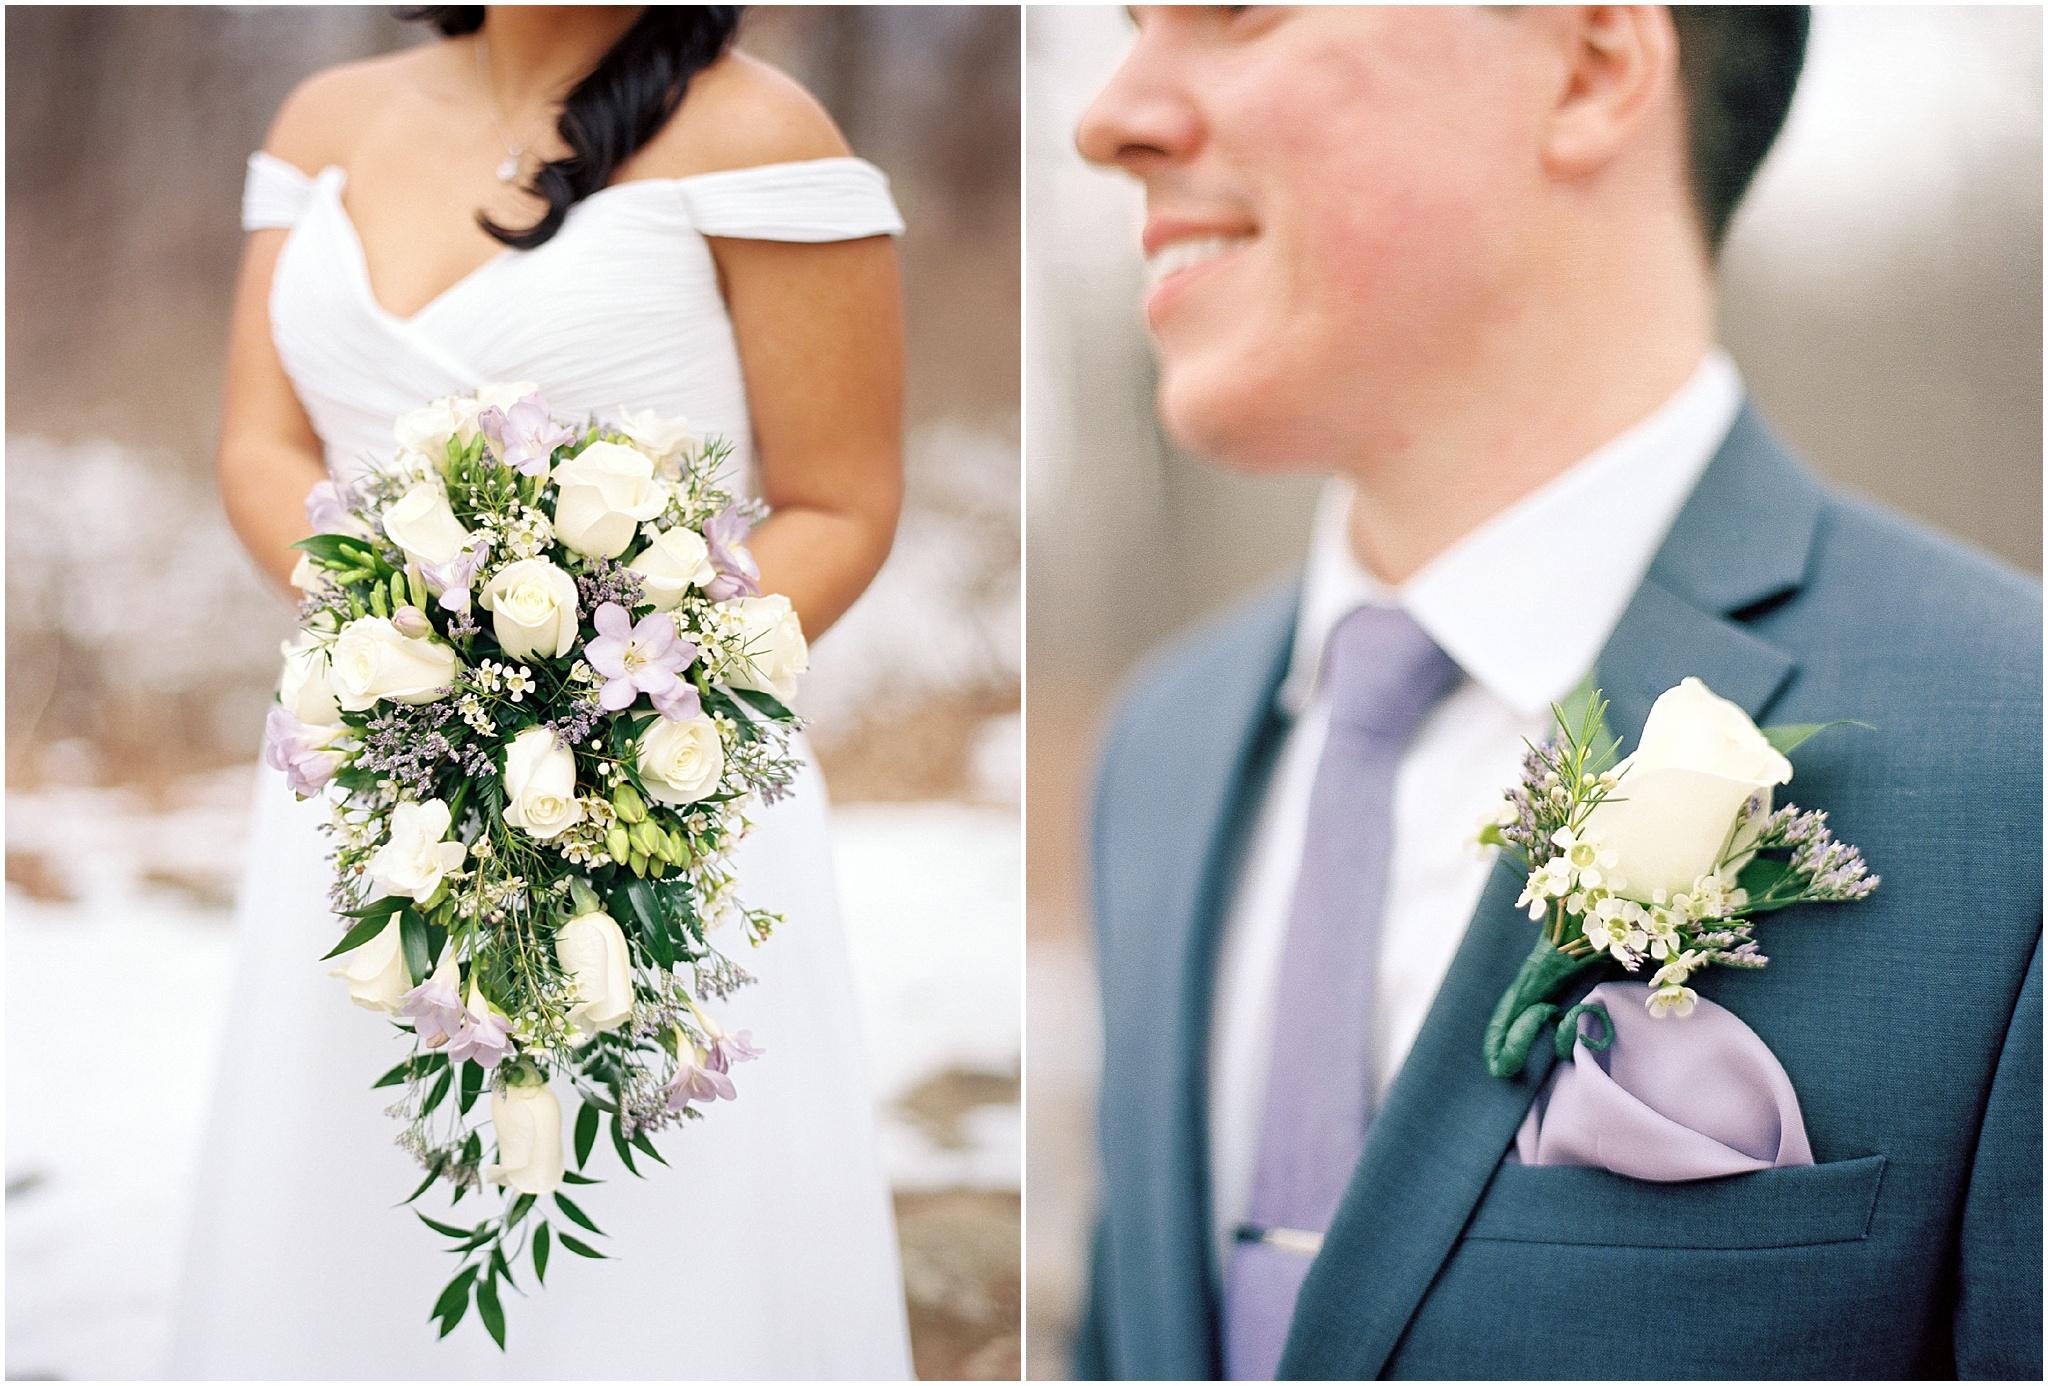 bride's bouquet and groom's boutonniere details, shot on photographic film, portra 400, fine art photography, elopement